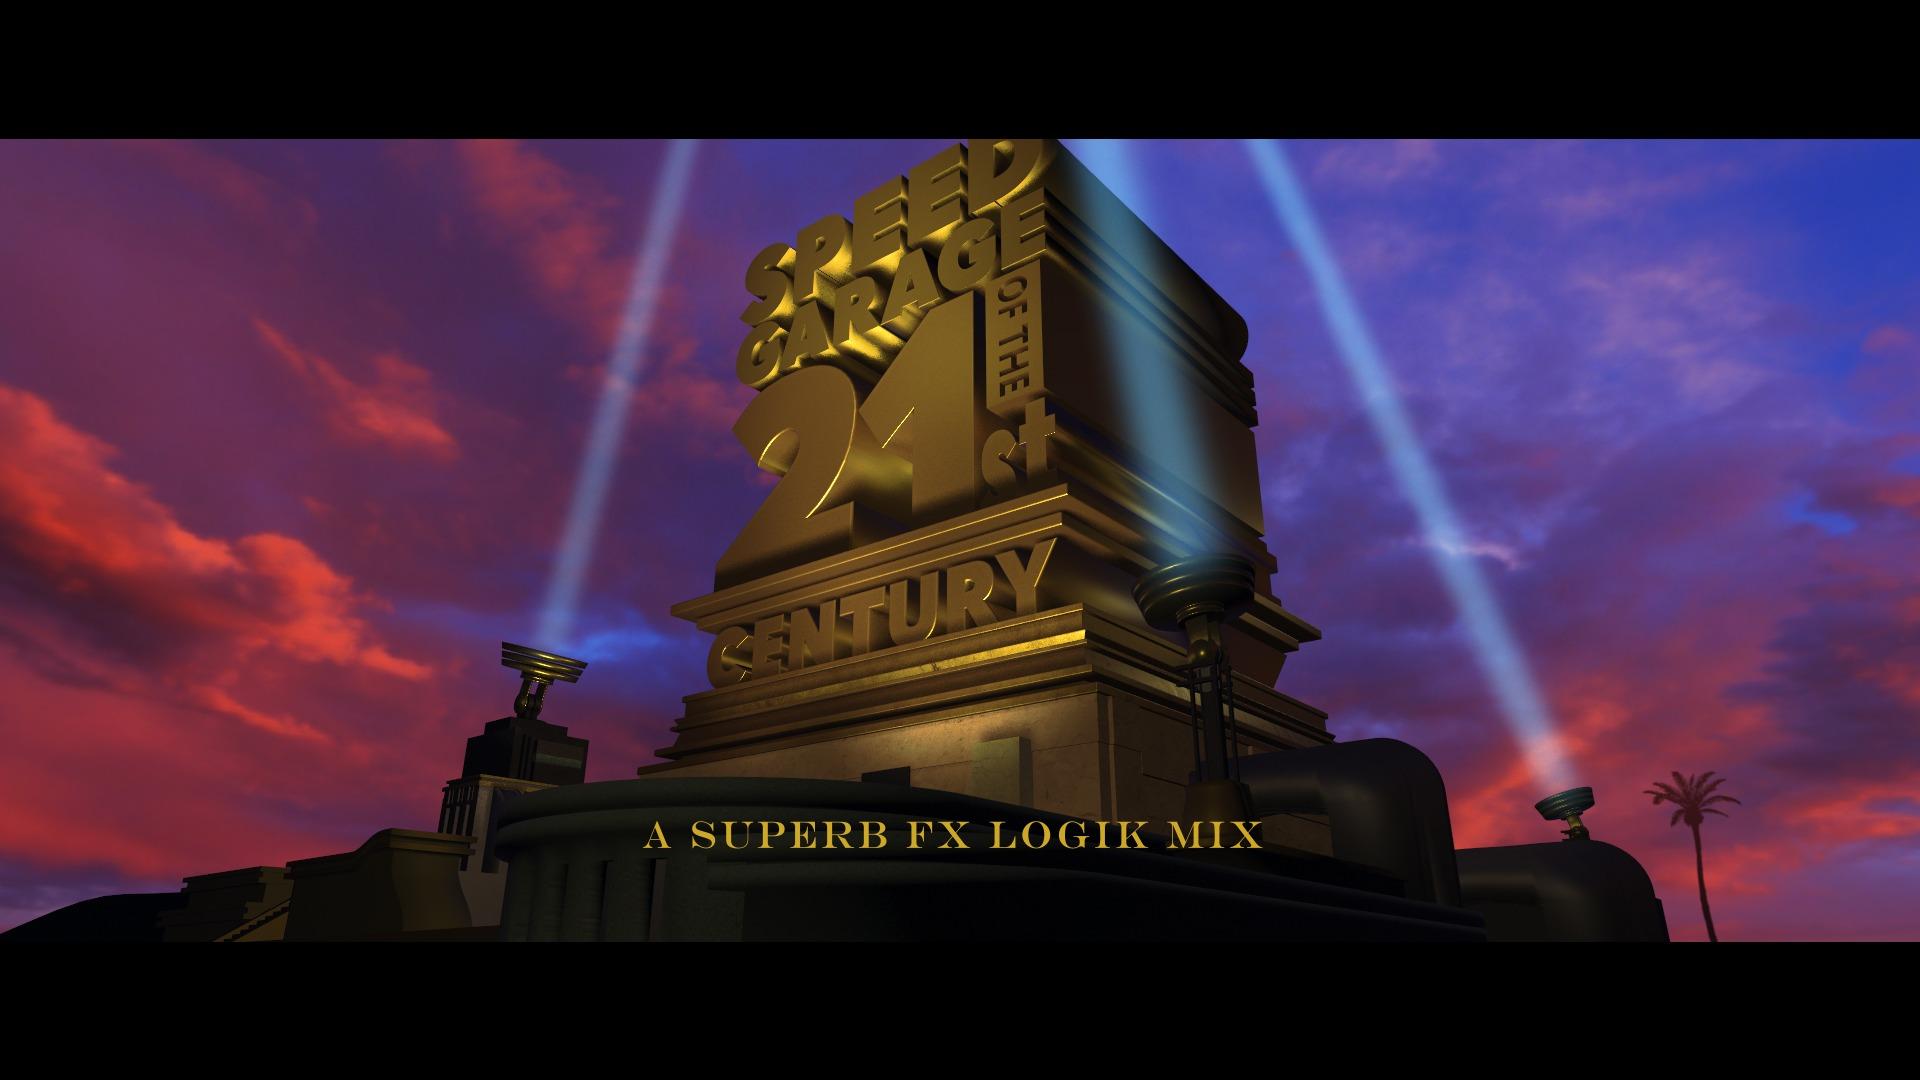 Sample of CGI by VSGFX based on 20th Century Fox logo reveal